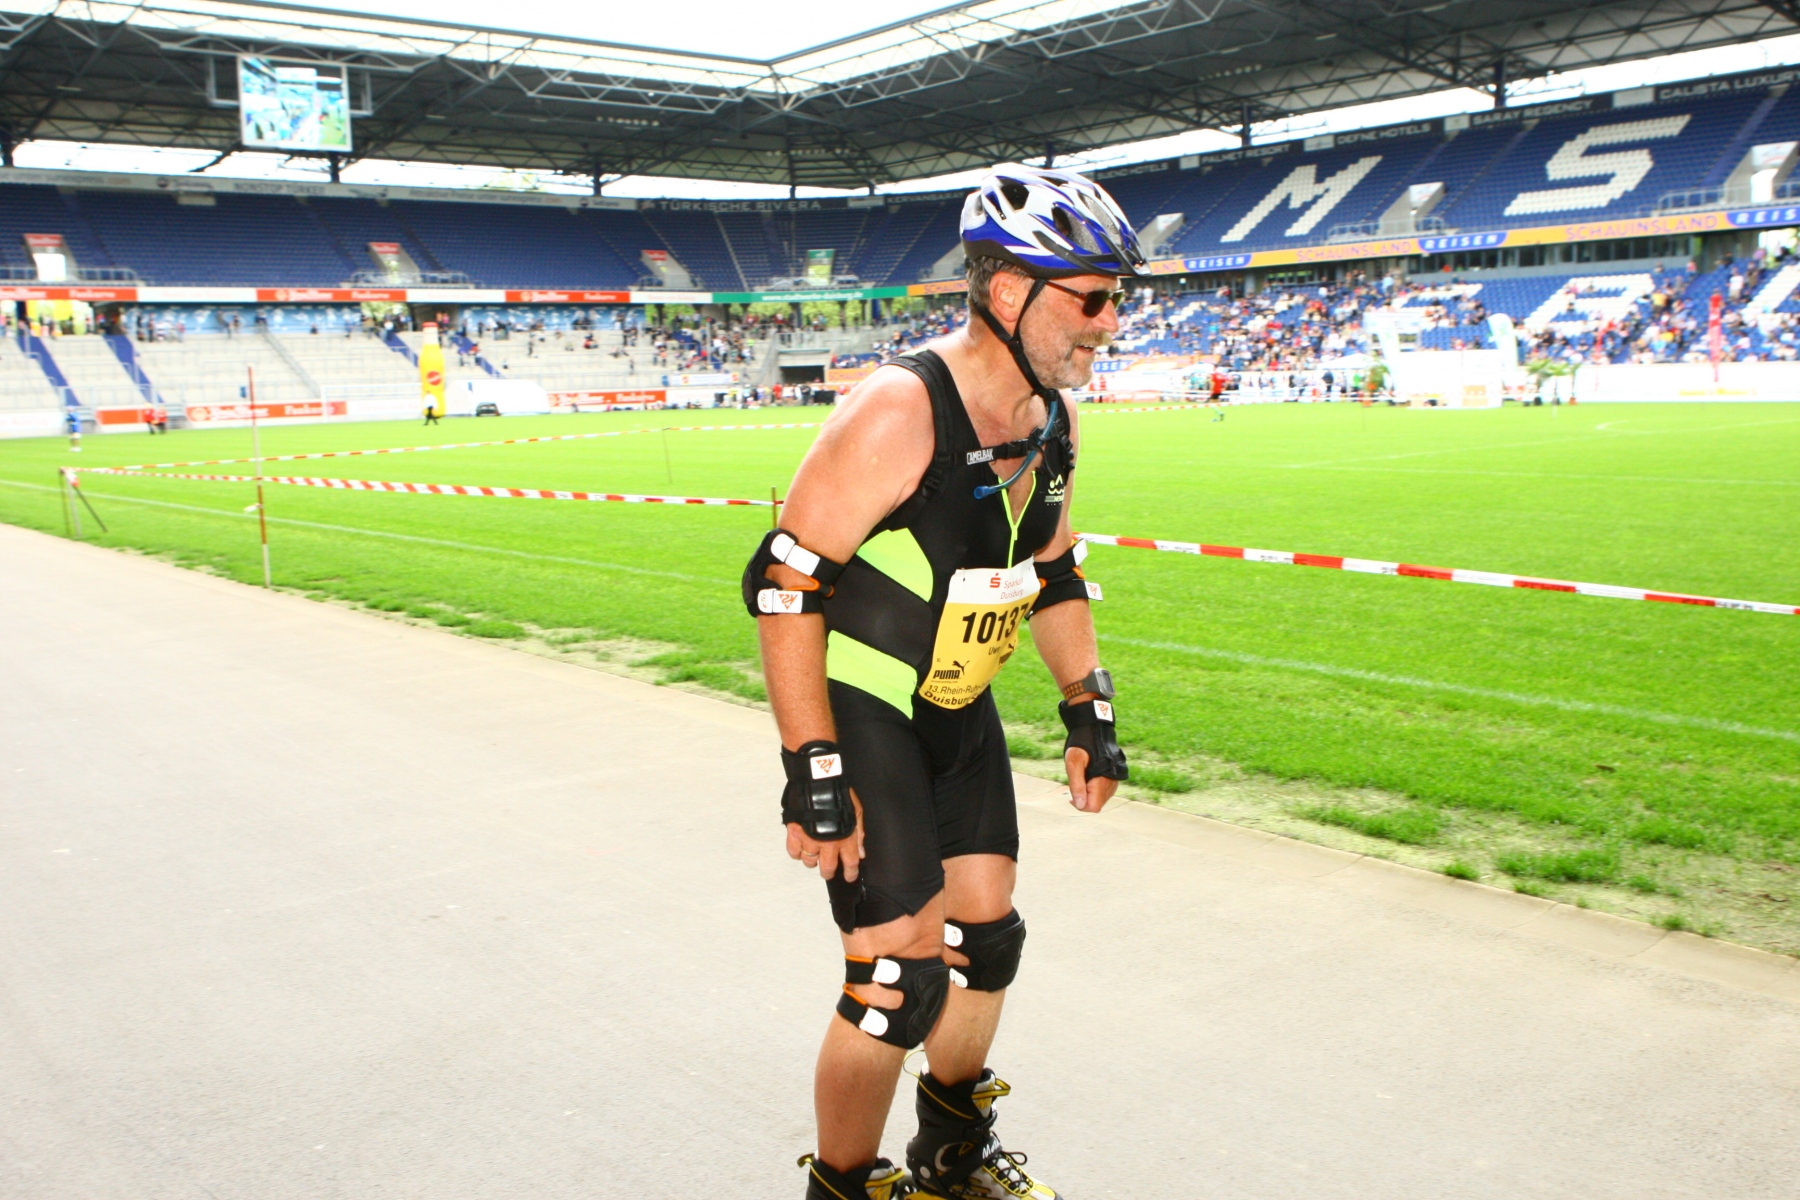 Duisburg Marathon 2012